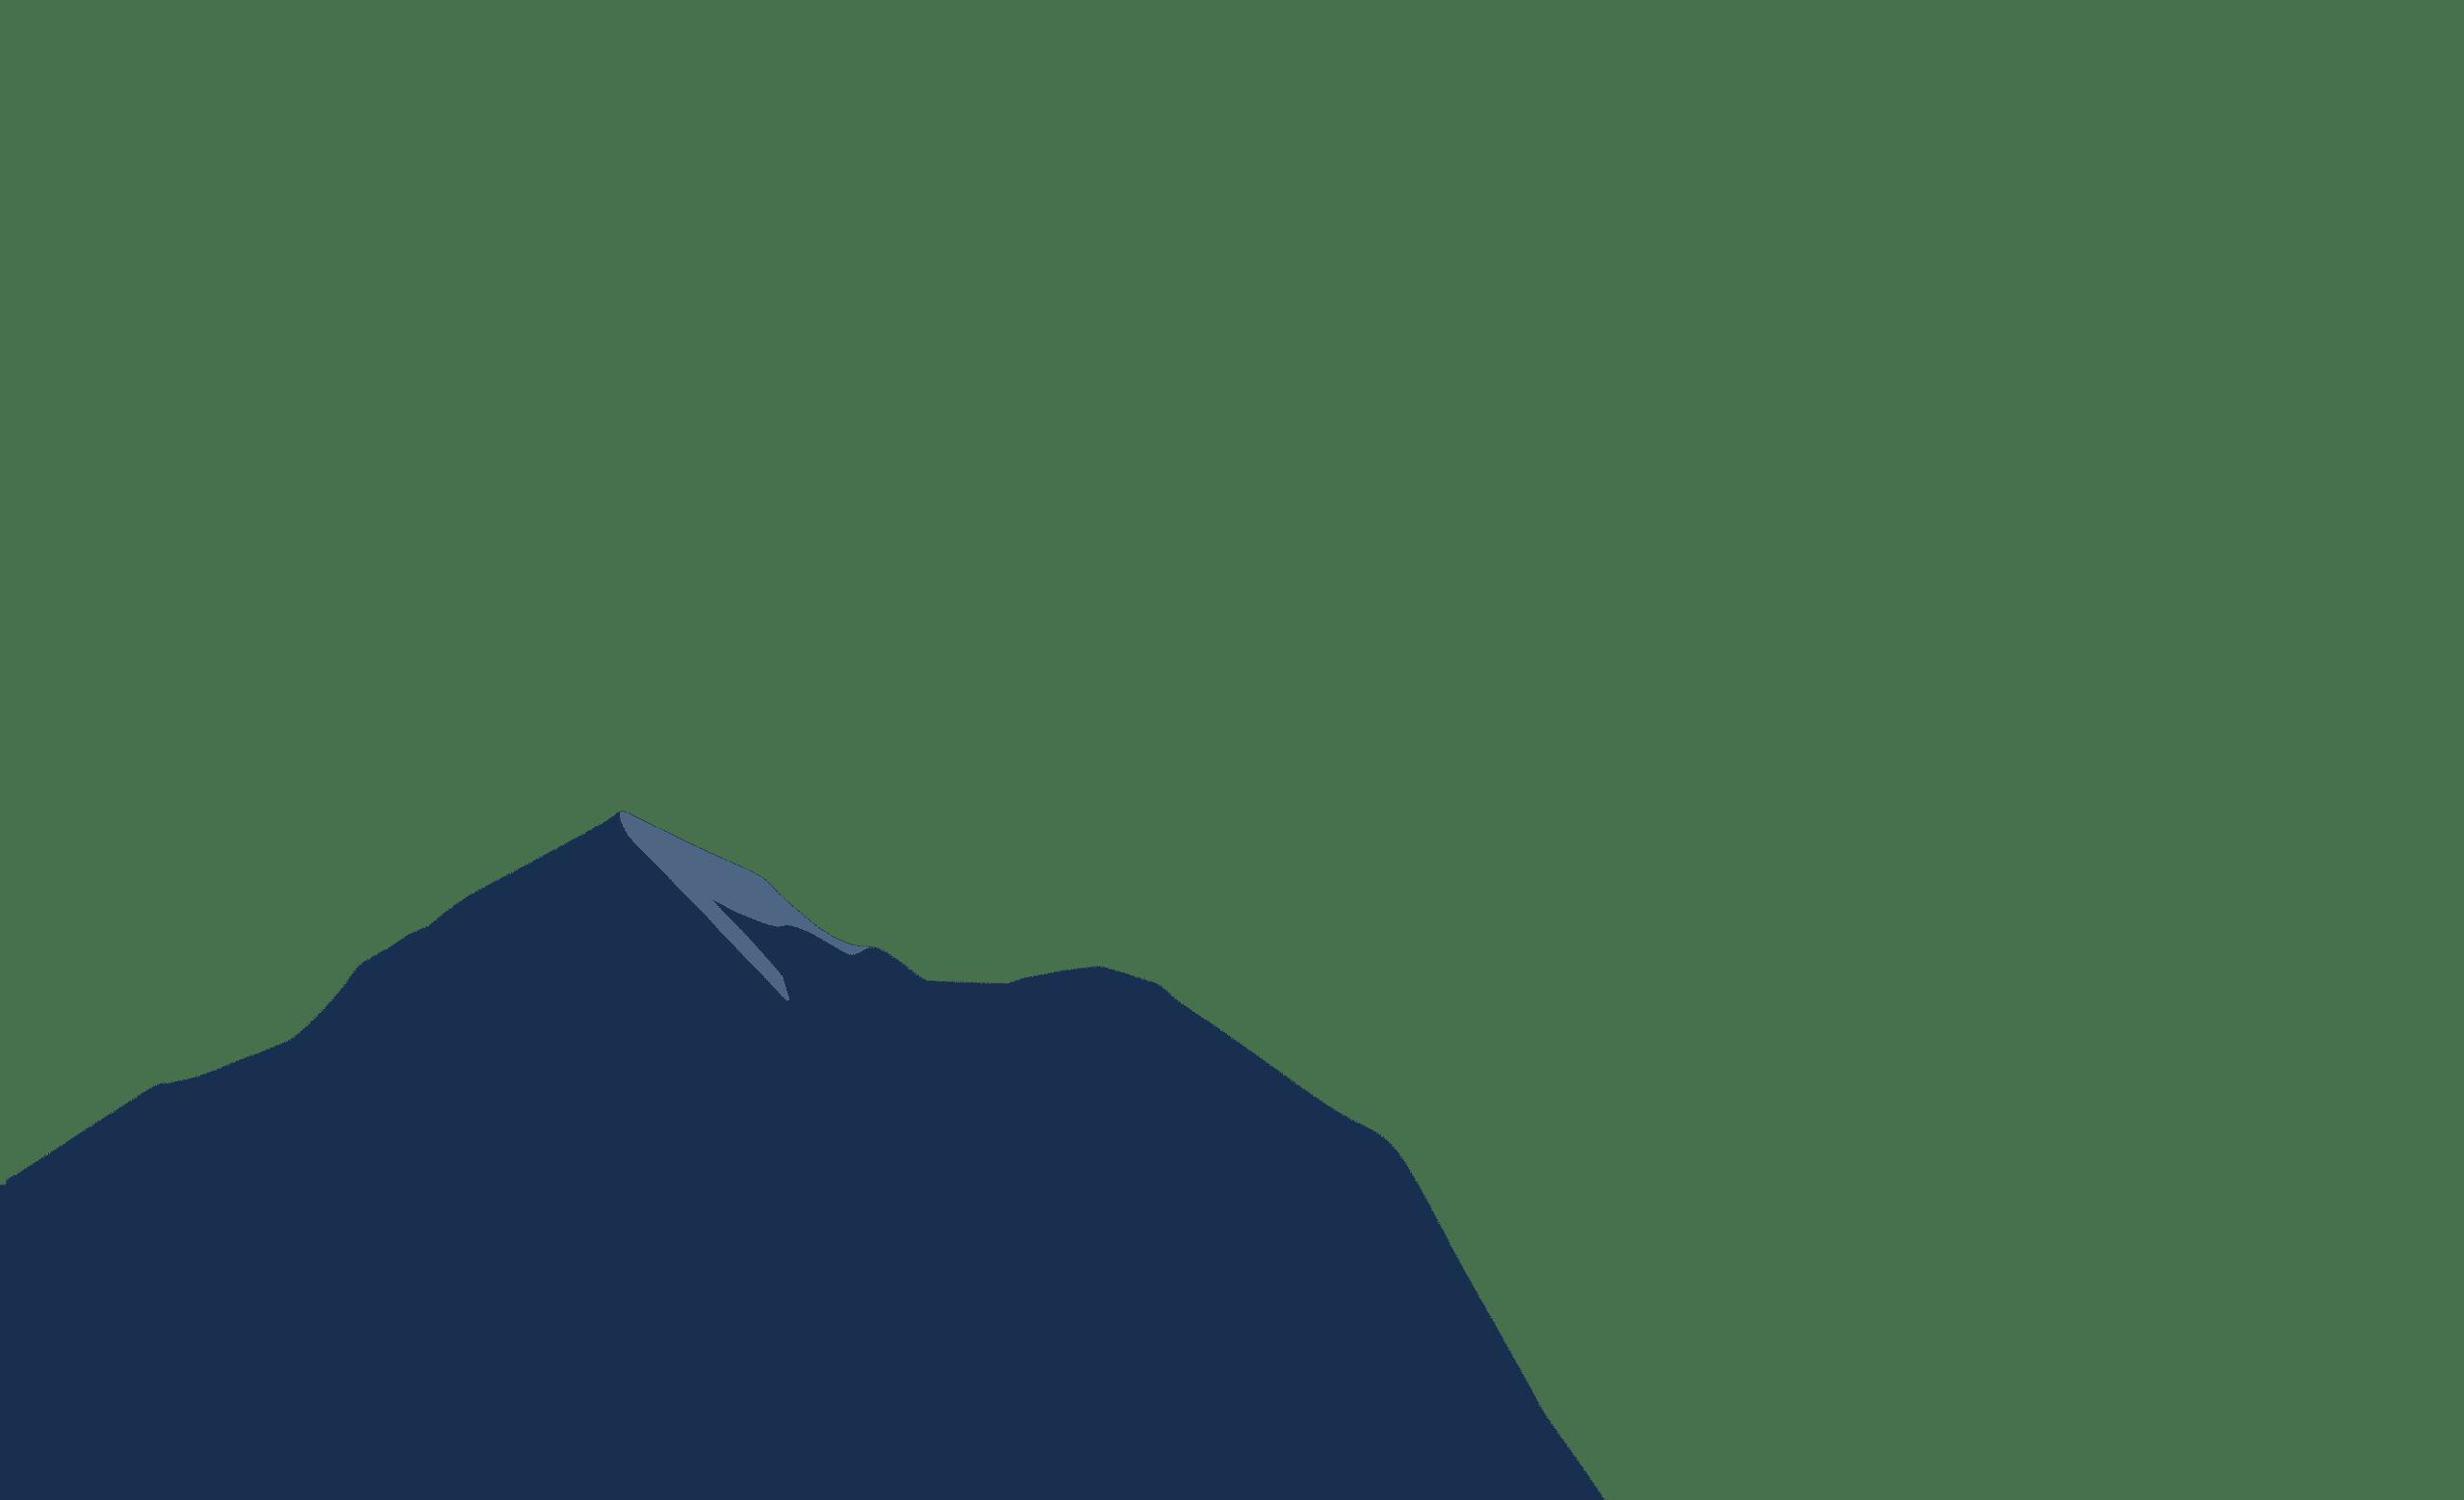 White Peak Digital Background